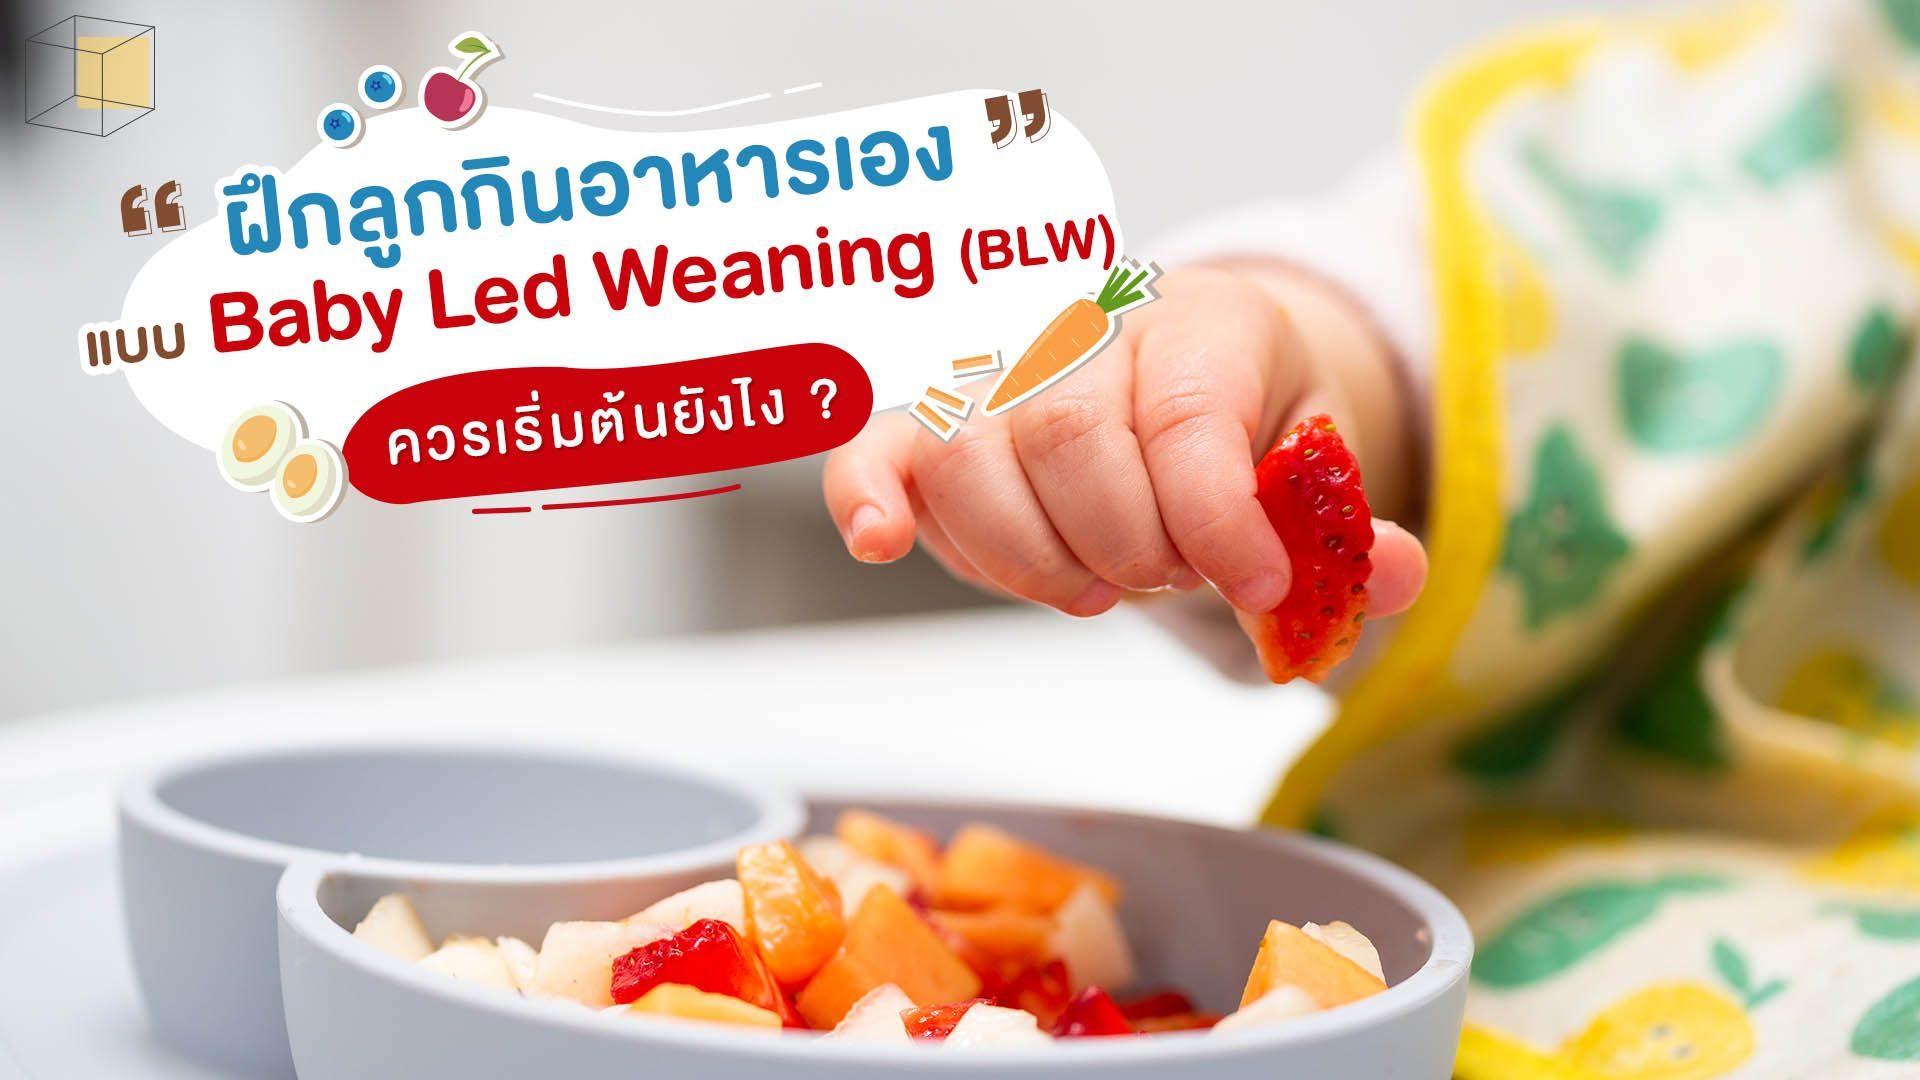 Baby Led Weaning (BLW) วิธีฝึกลูกกินข้าวเองให้เป็น